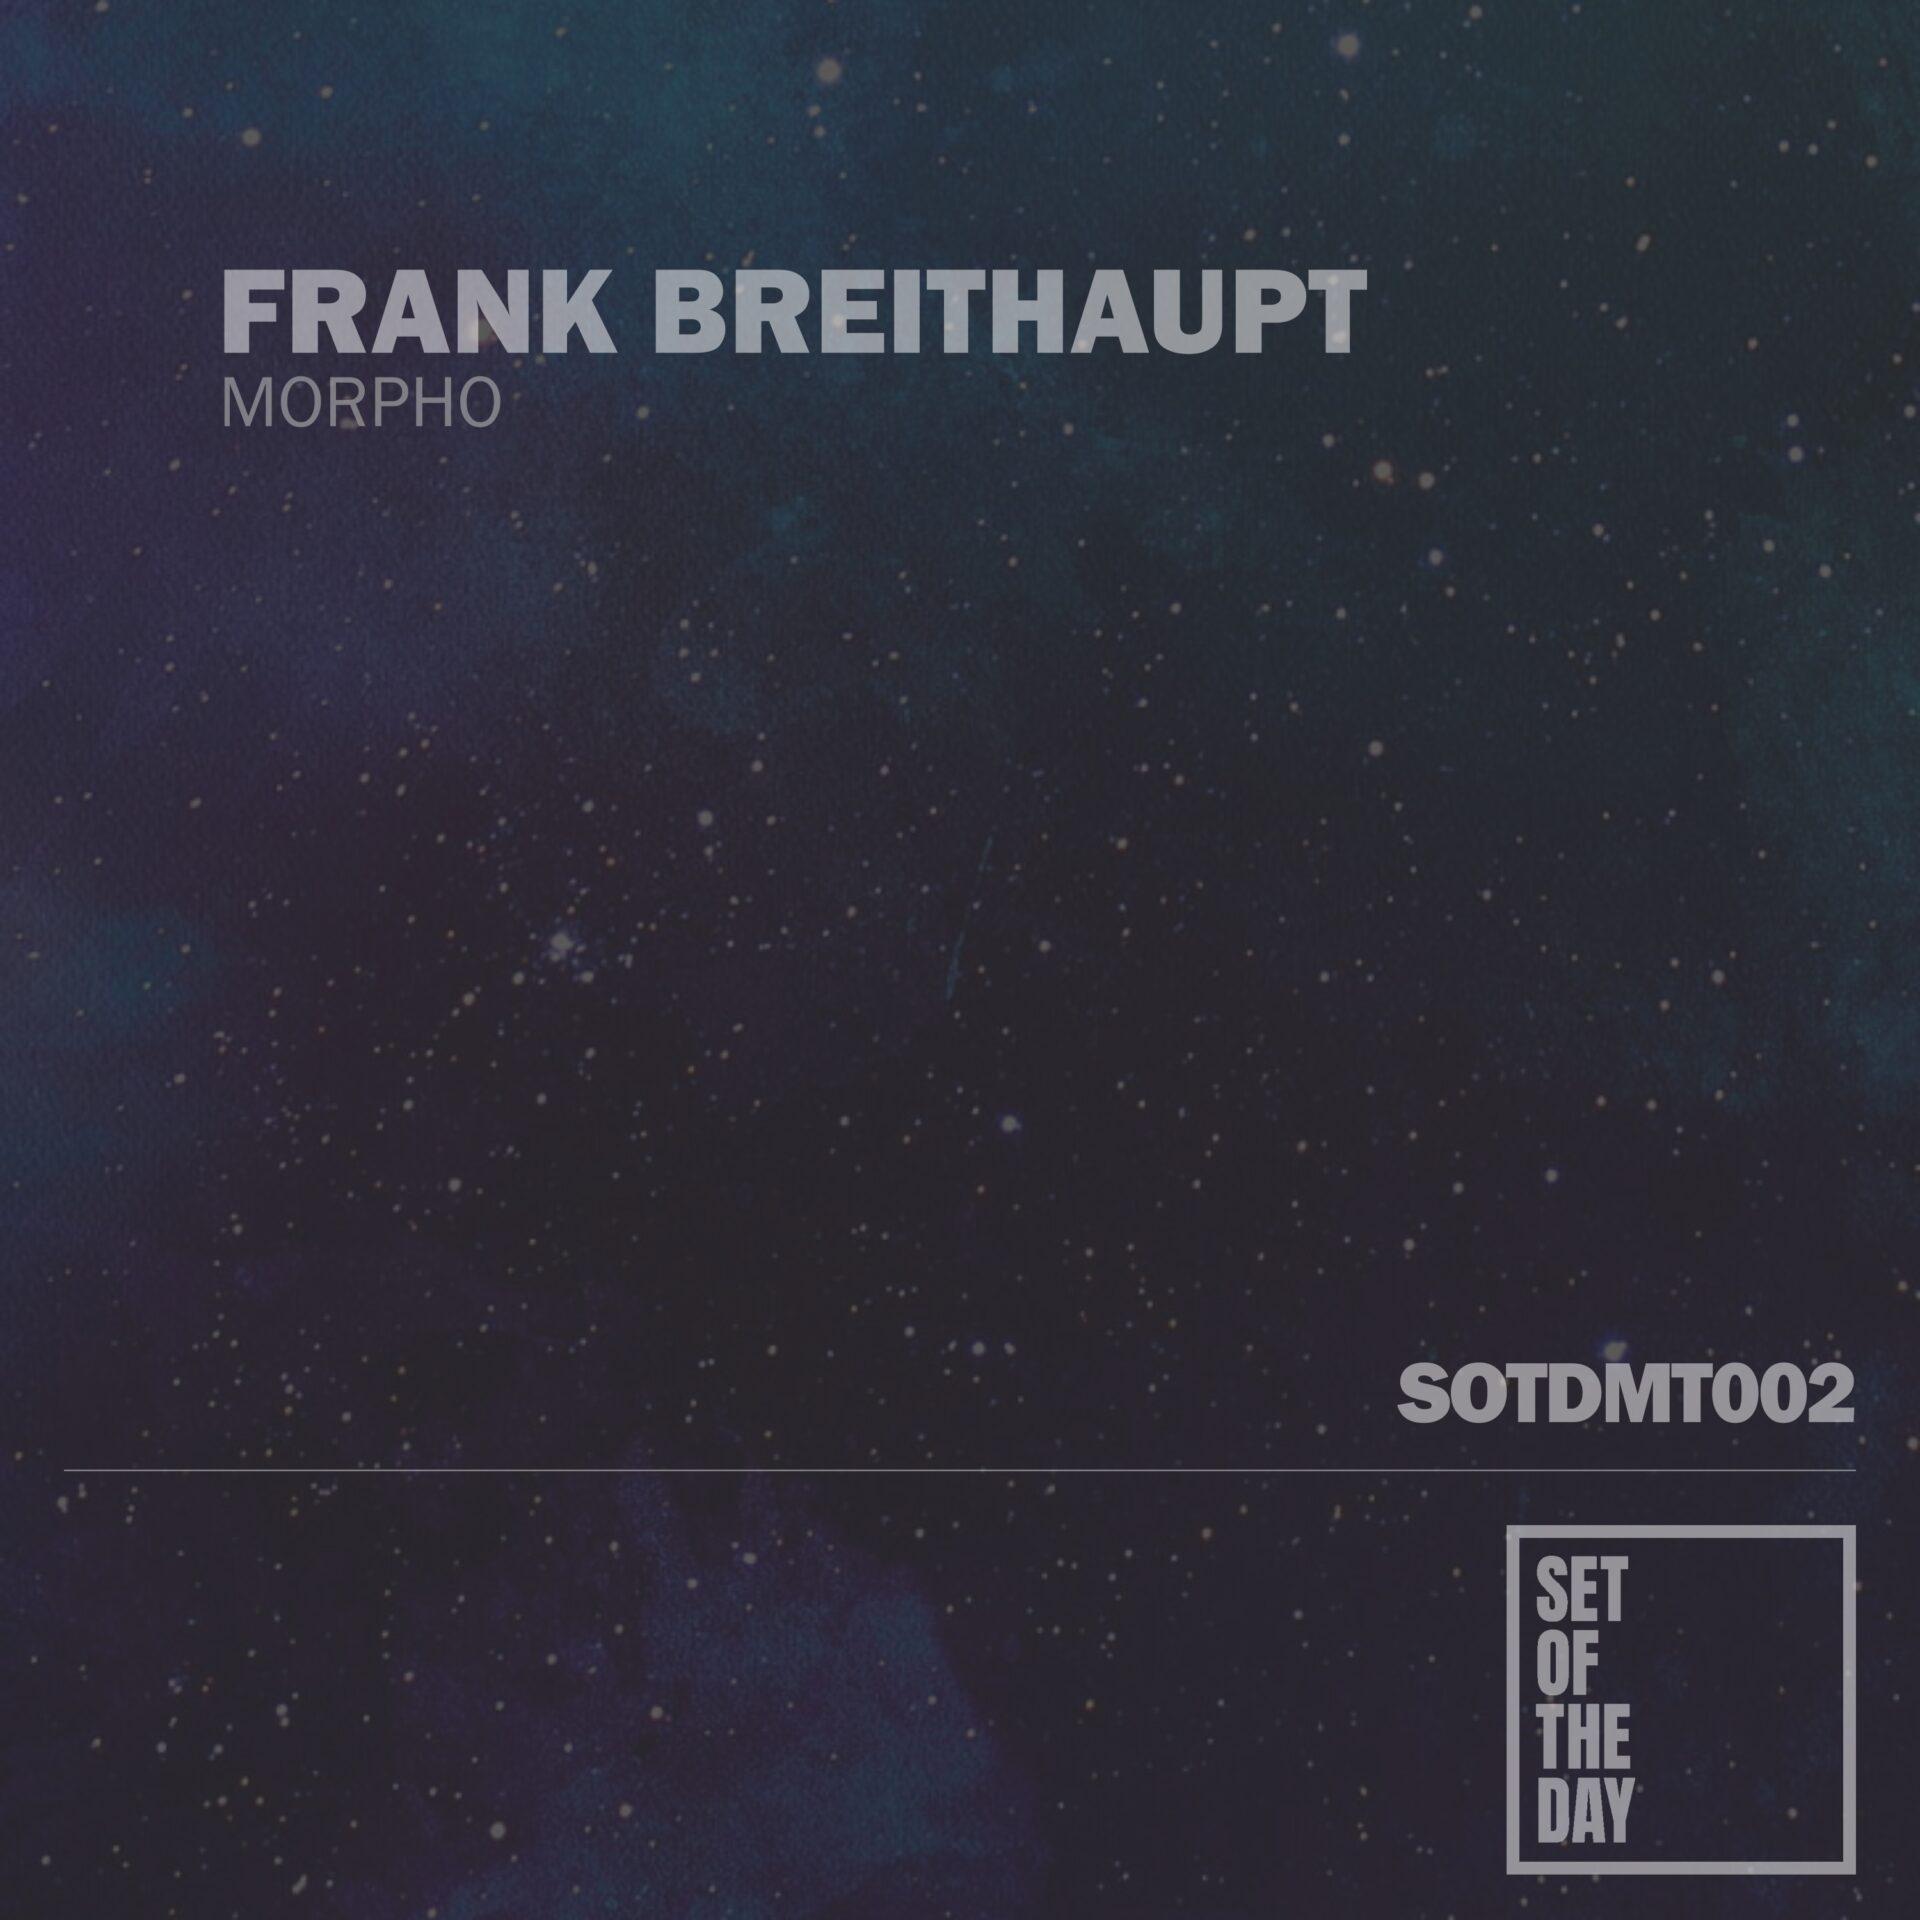 sotdmt002-frank-breithaupt-morpho-1920x1920 - Releases